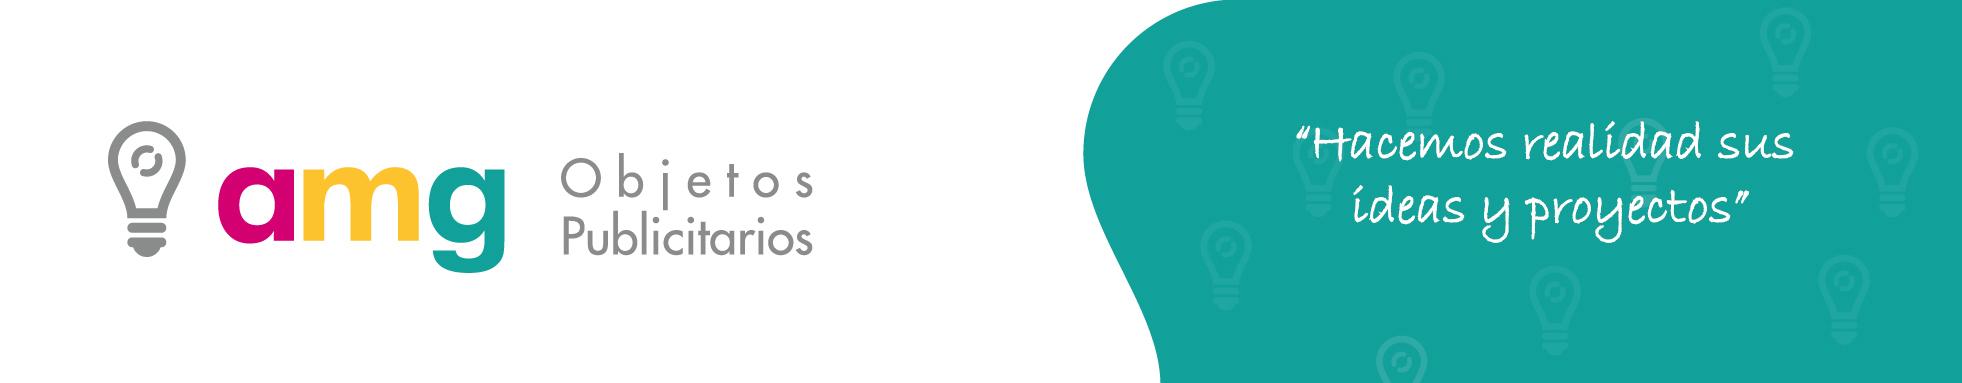 AMG Objetos Publicitarios Logo